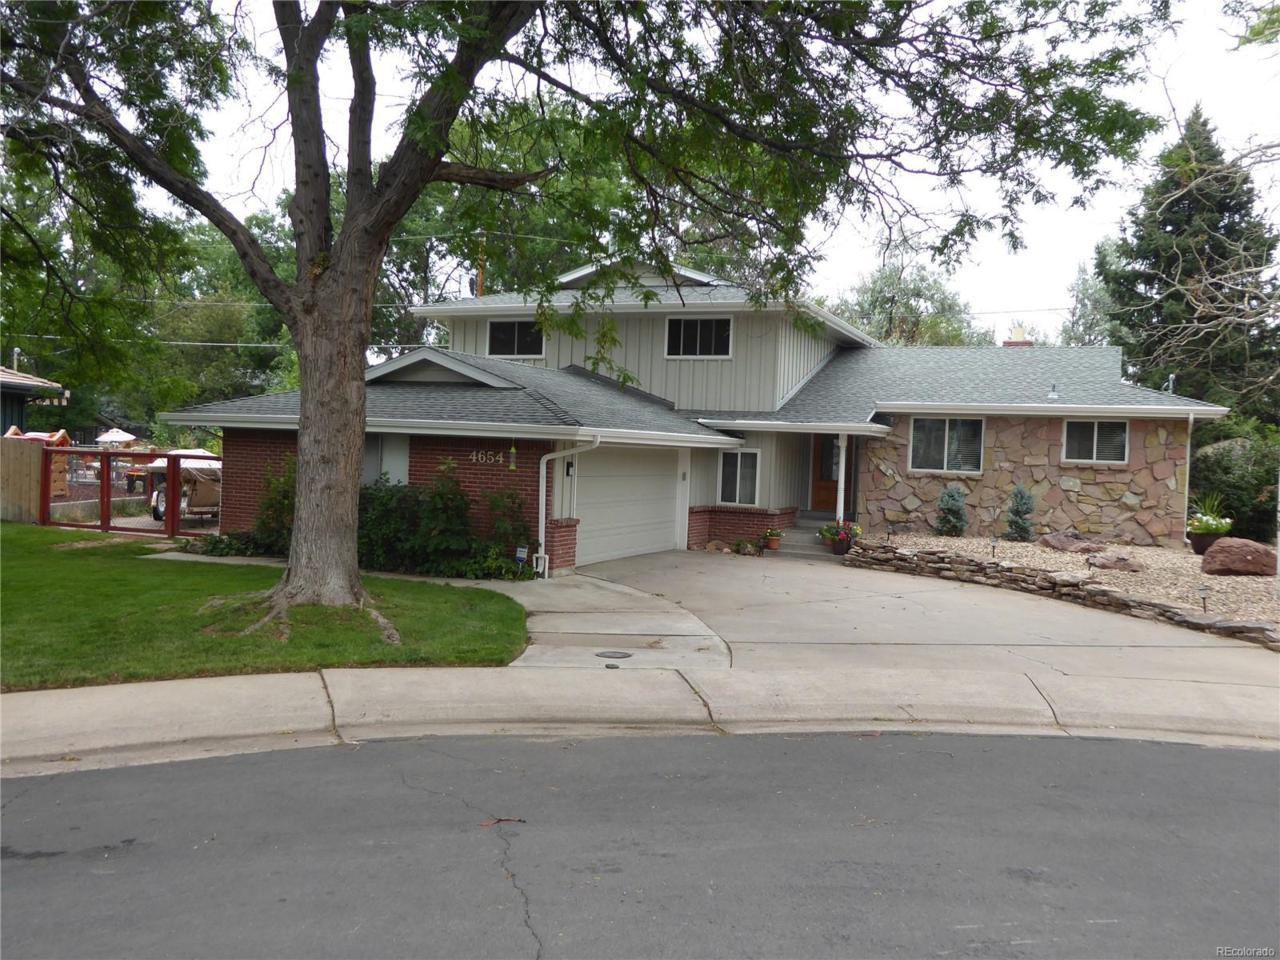 4654 W Tufts Circle, Denver, CO 80236 (MLS #6222551) :: 8z Real Estate